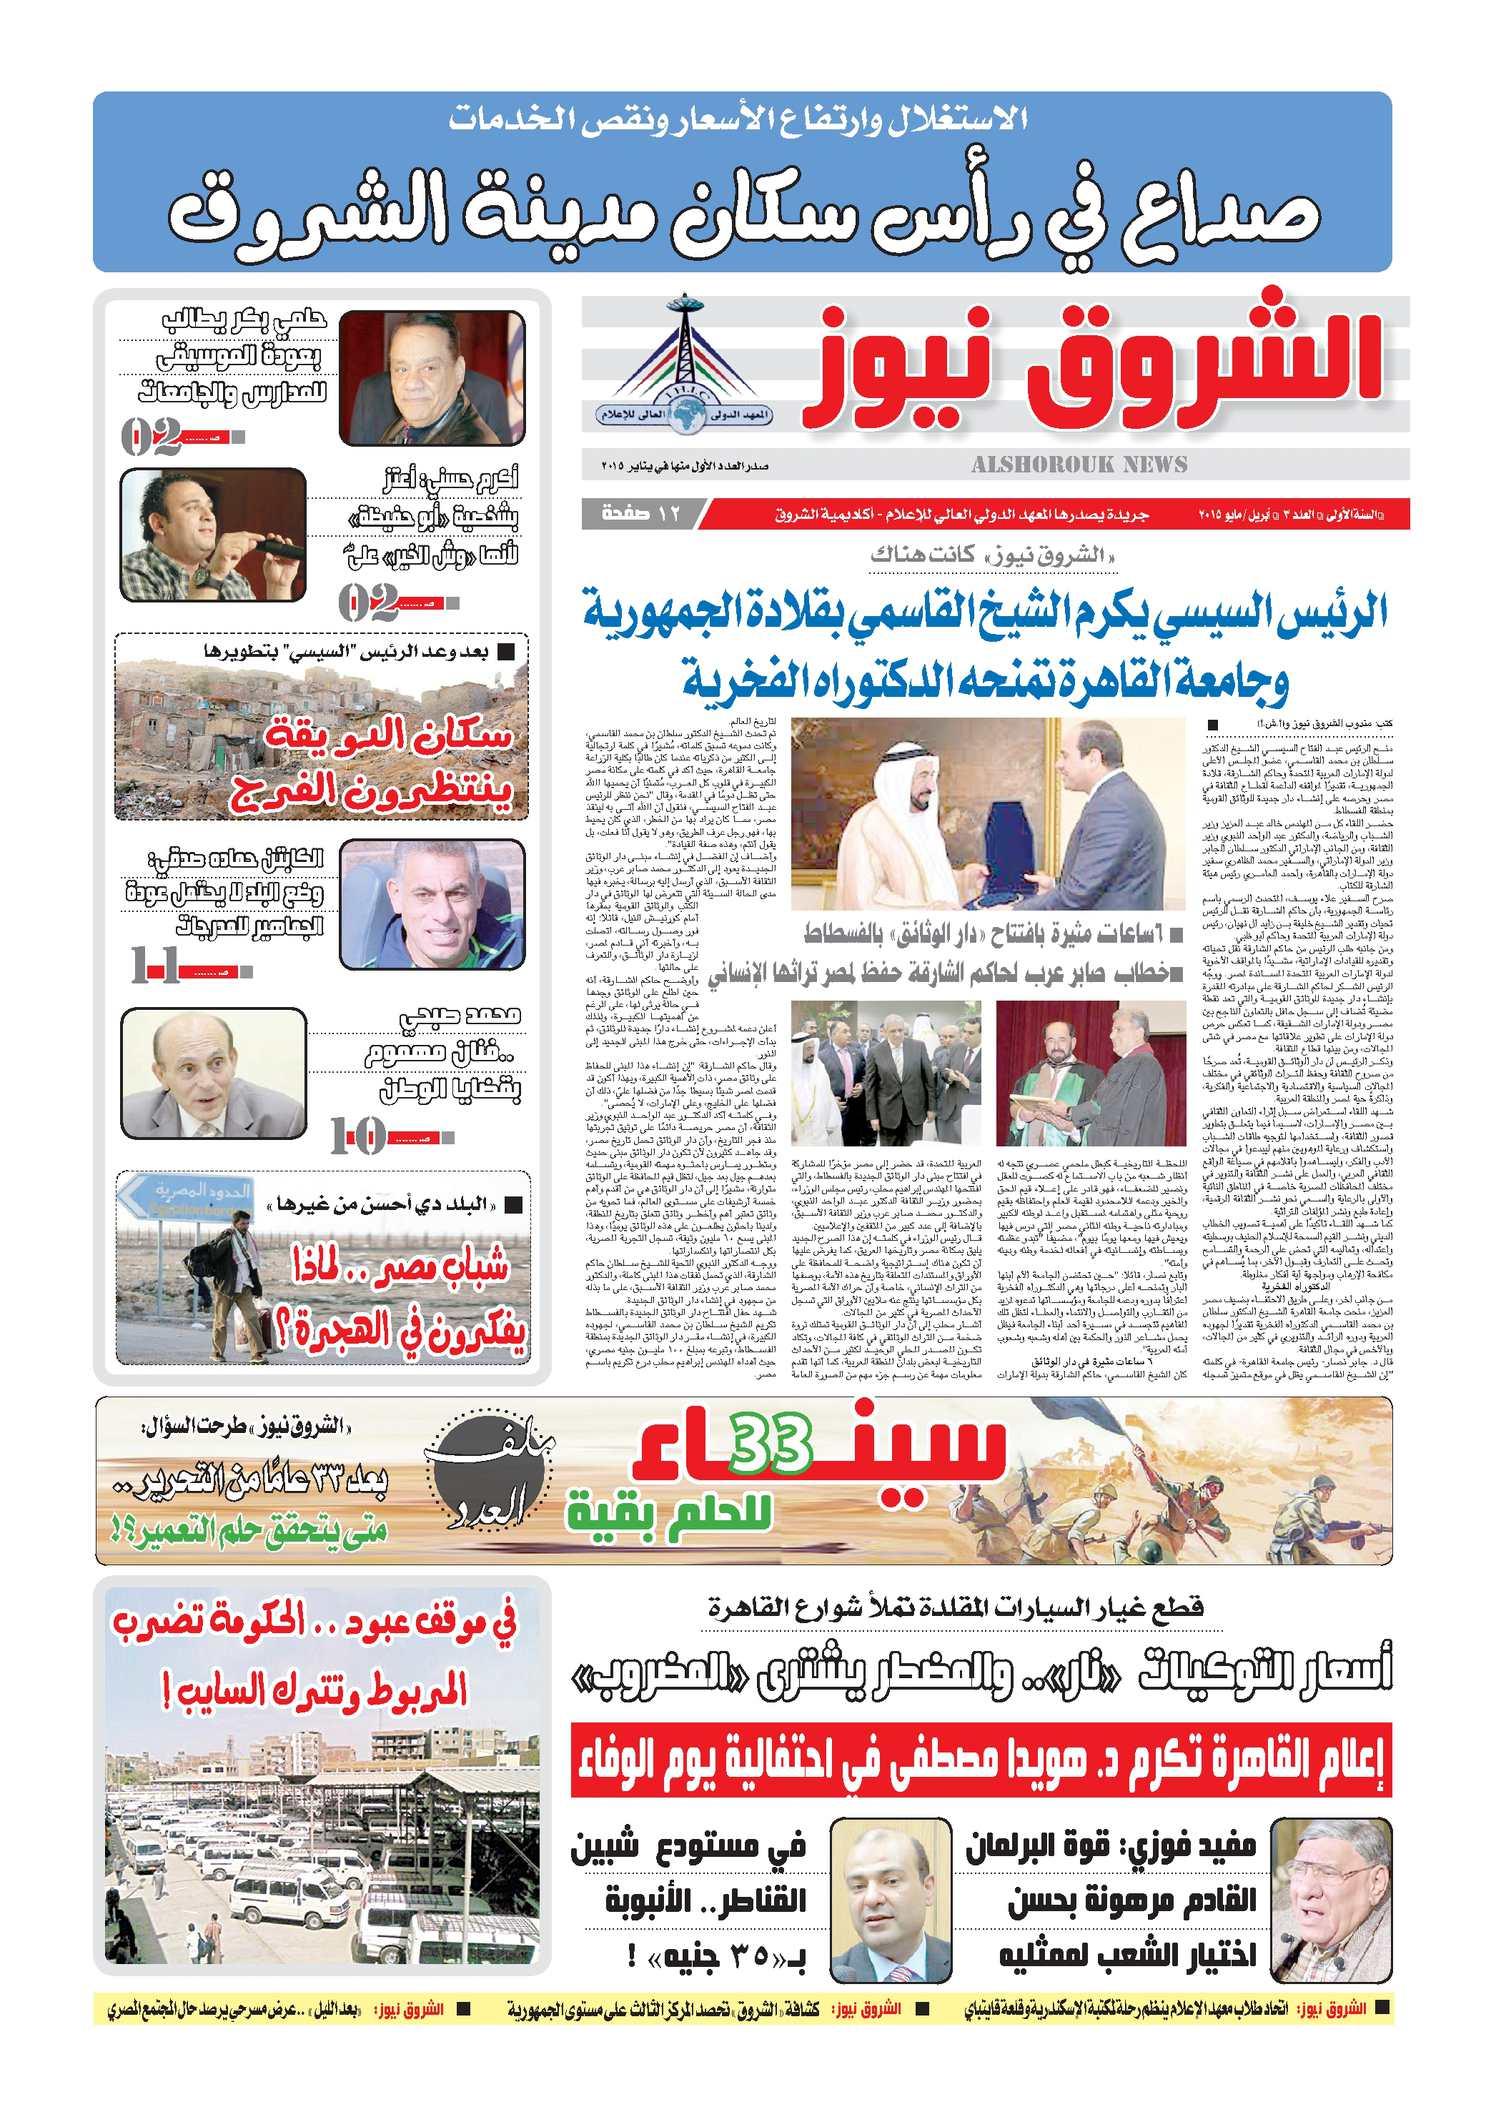 94fff2b385f44 Calaméo - Alshrouk News Third Issue May 2015